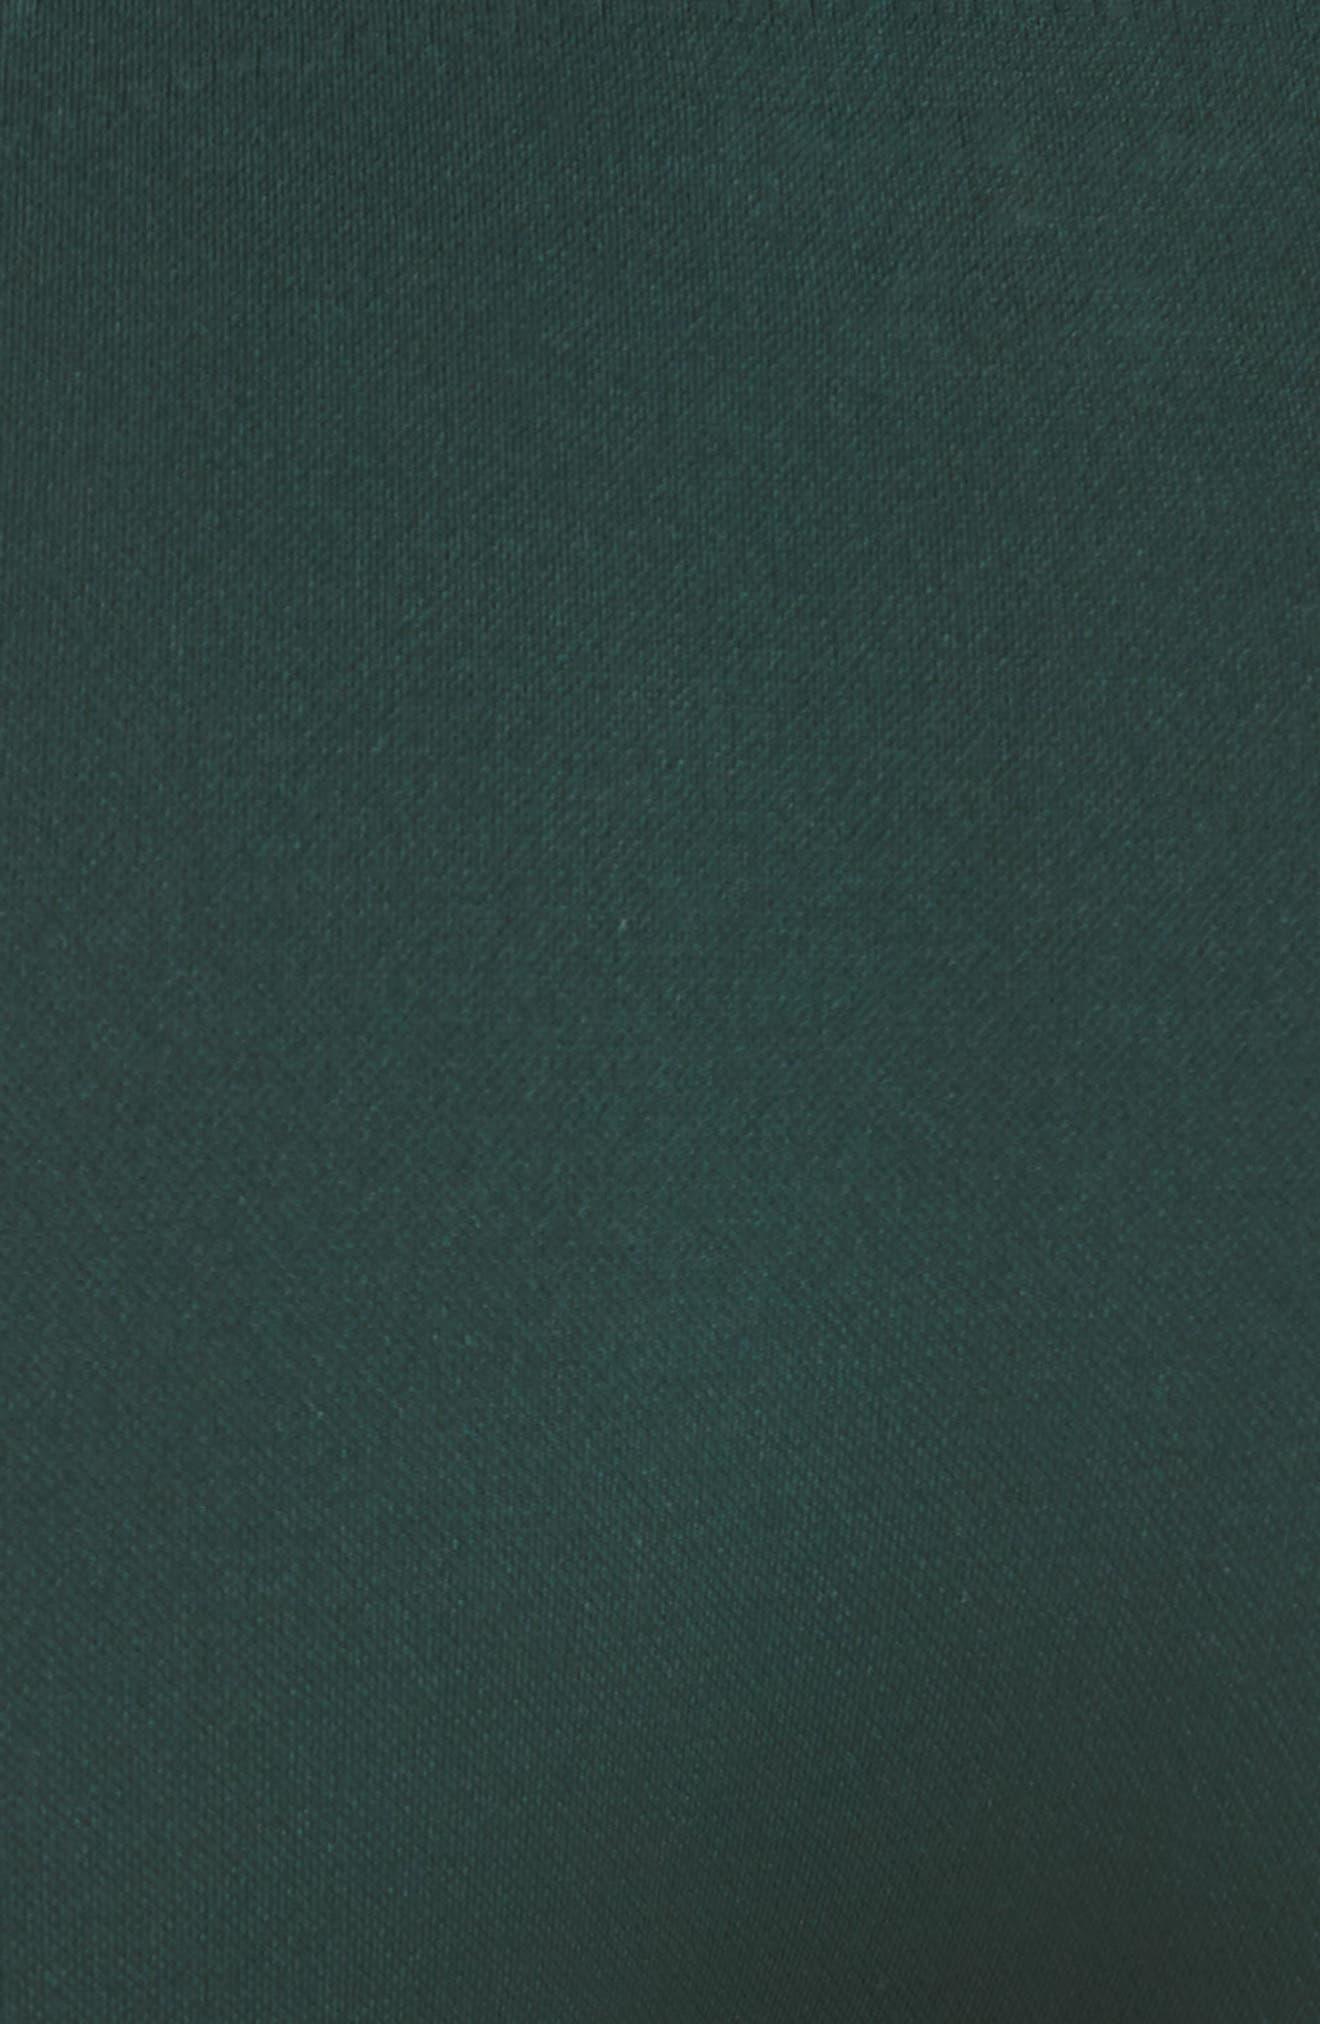 TORY SPORT, Seamless Chevron High Waist Leggings, Alternate thumbnail 6, color, CONIFER